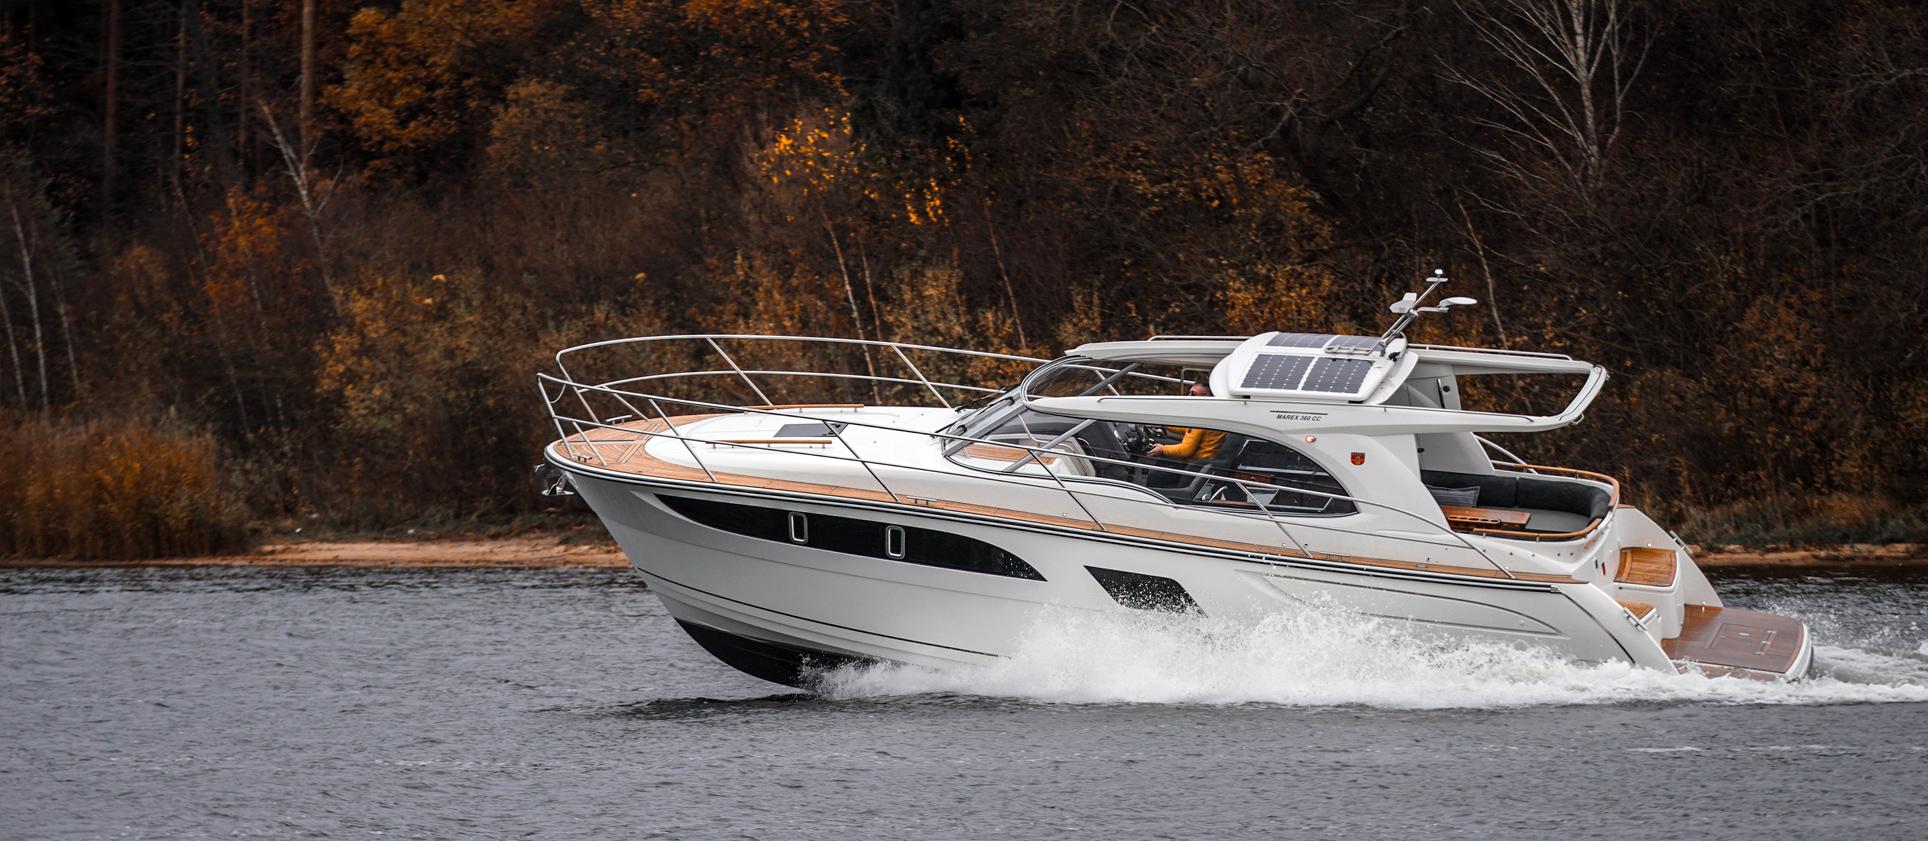 Immatriculation des yachts